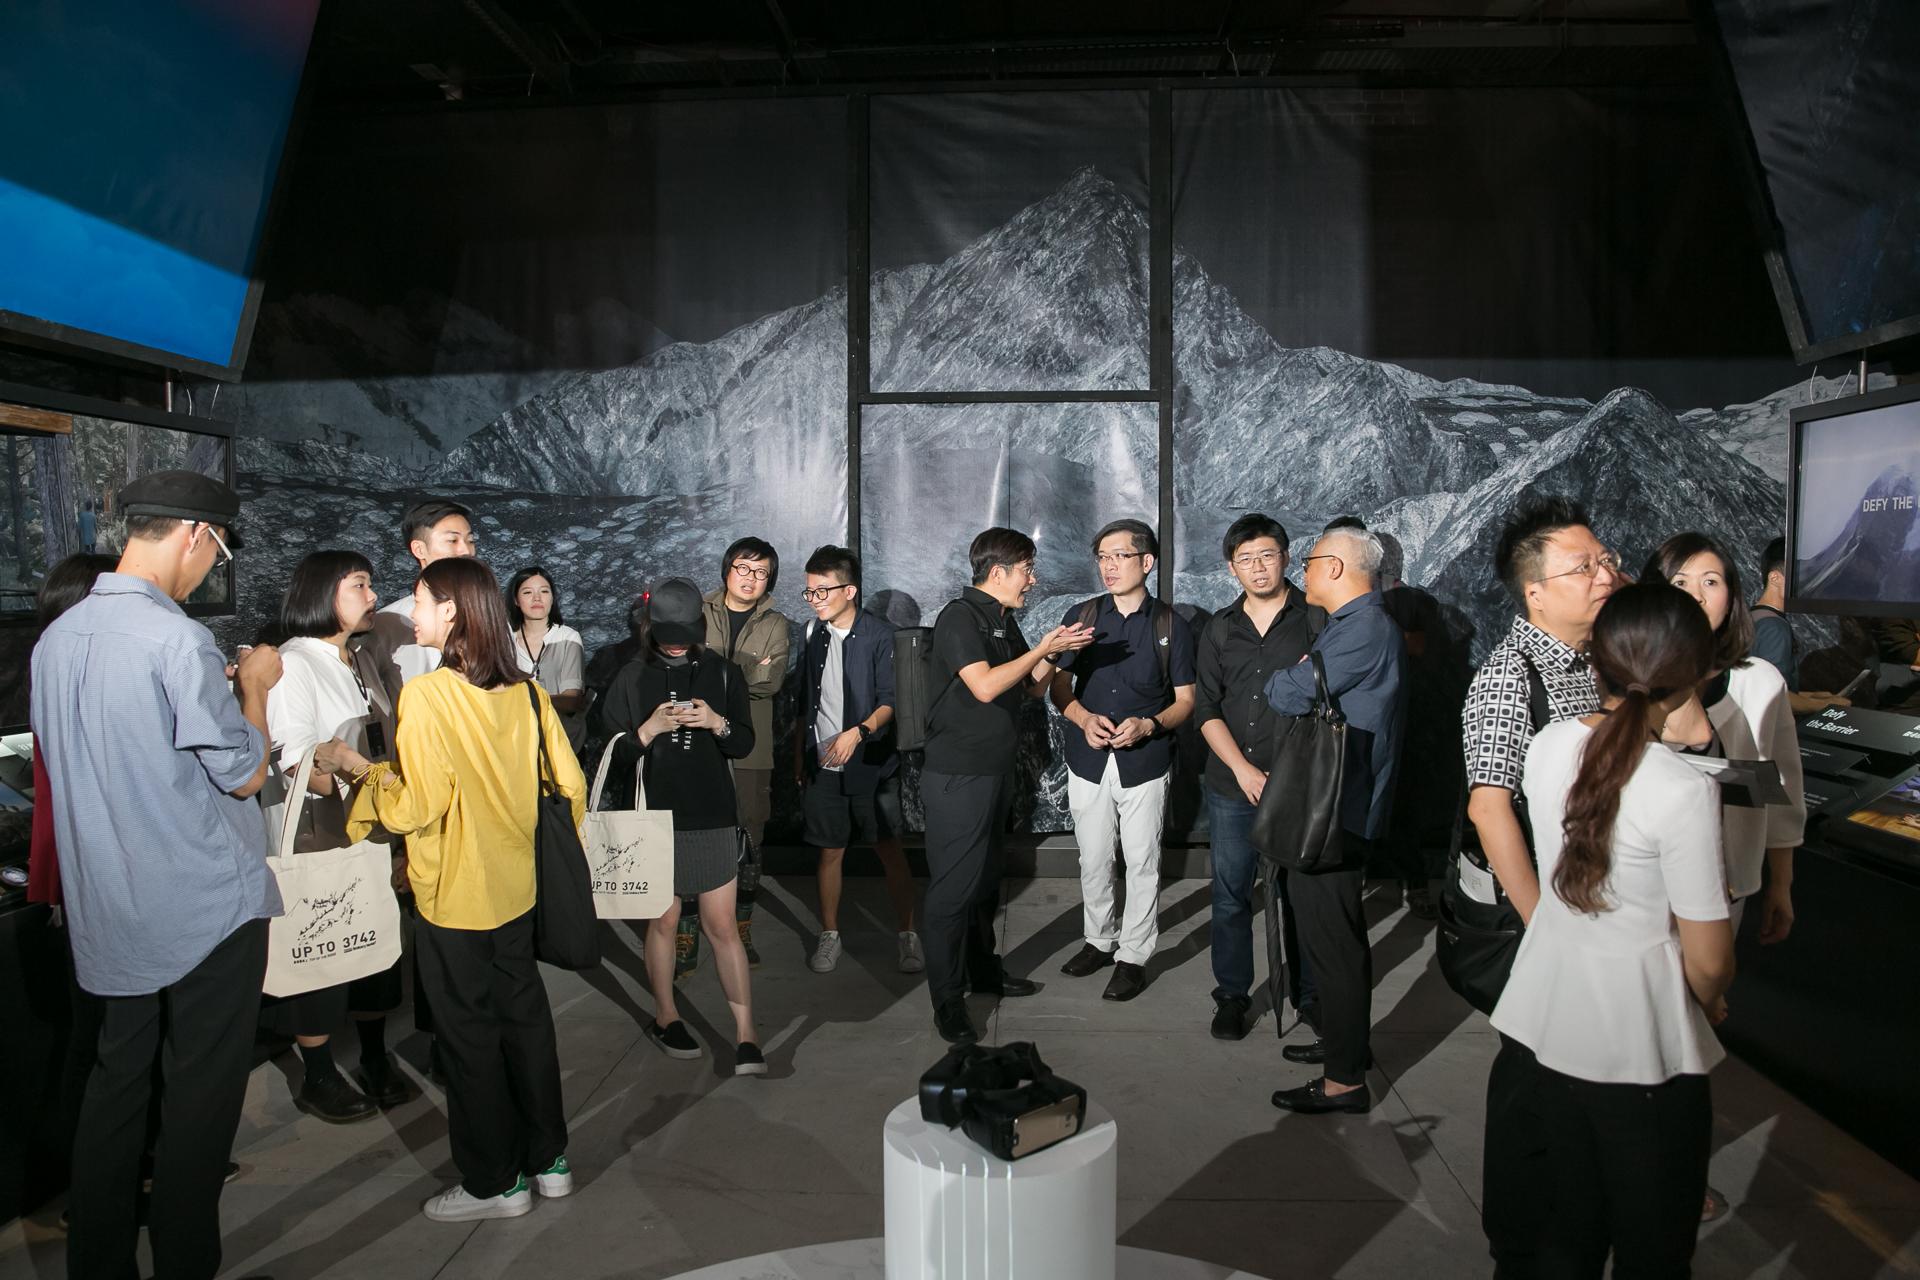 UP TO 3742|臺灣屋脊上|展覽開幕 — INFORMAT DESIGN